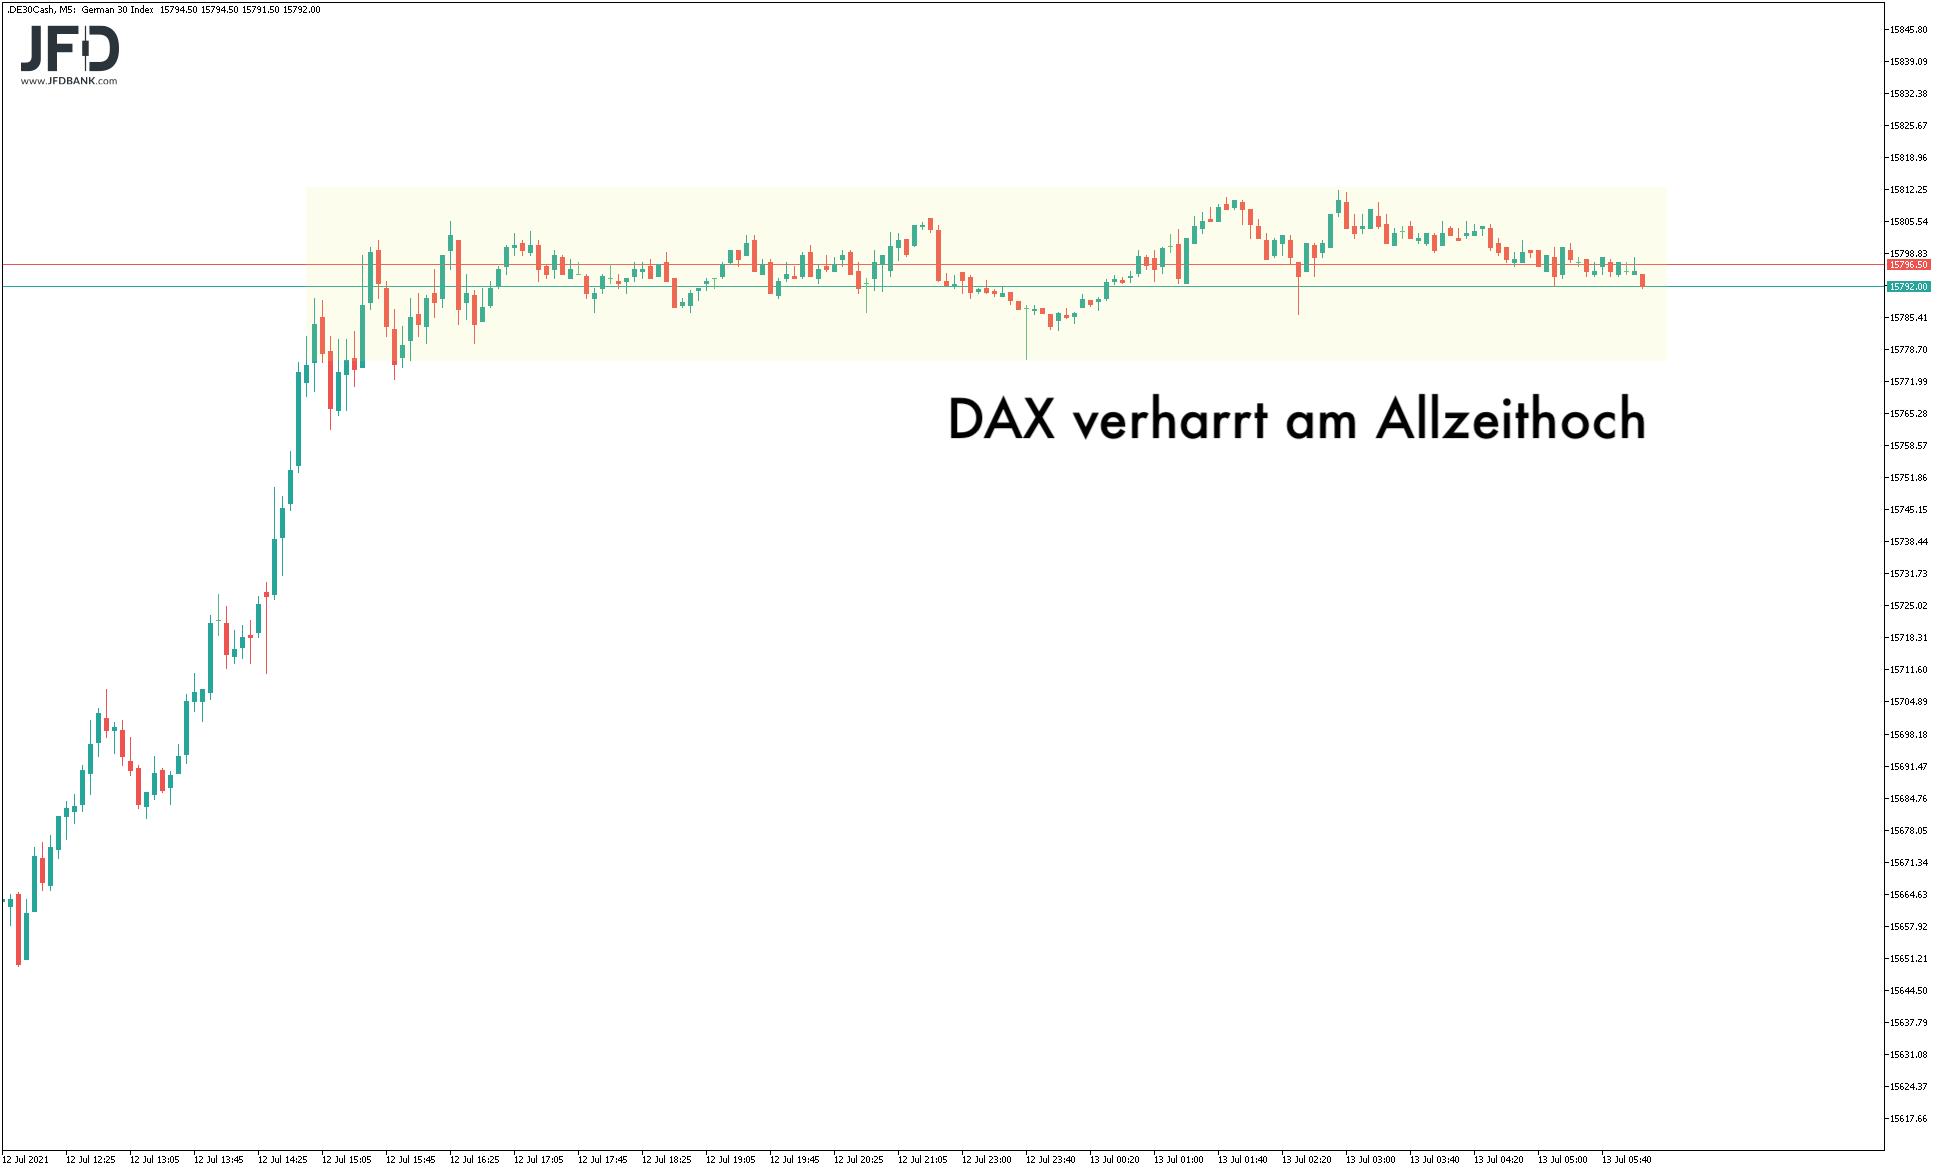 DAX-Vorbörse am Dienstag